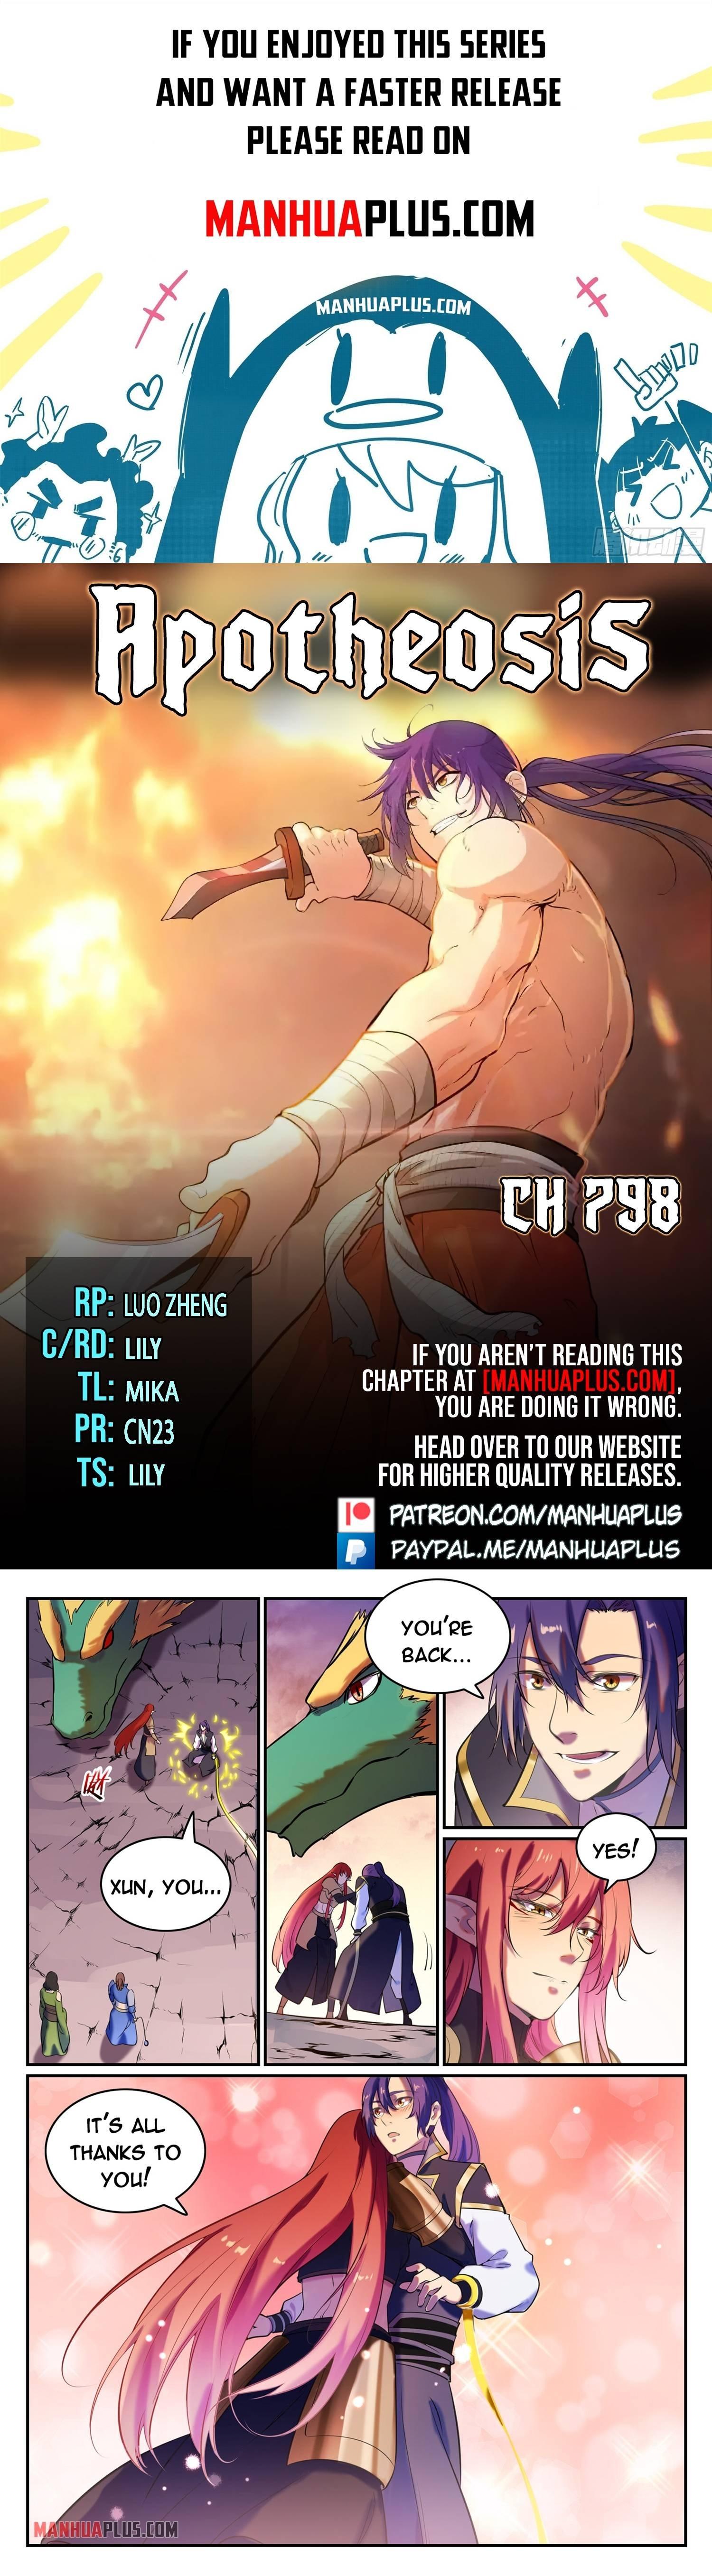 Manga Apotheosis - Chapter 798 Page 1